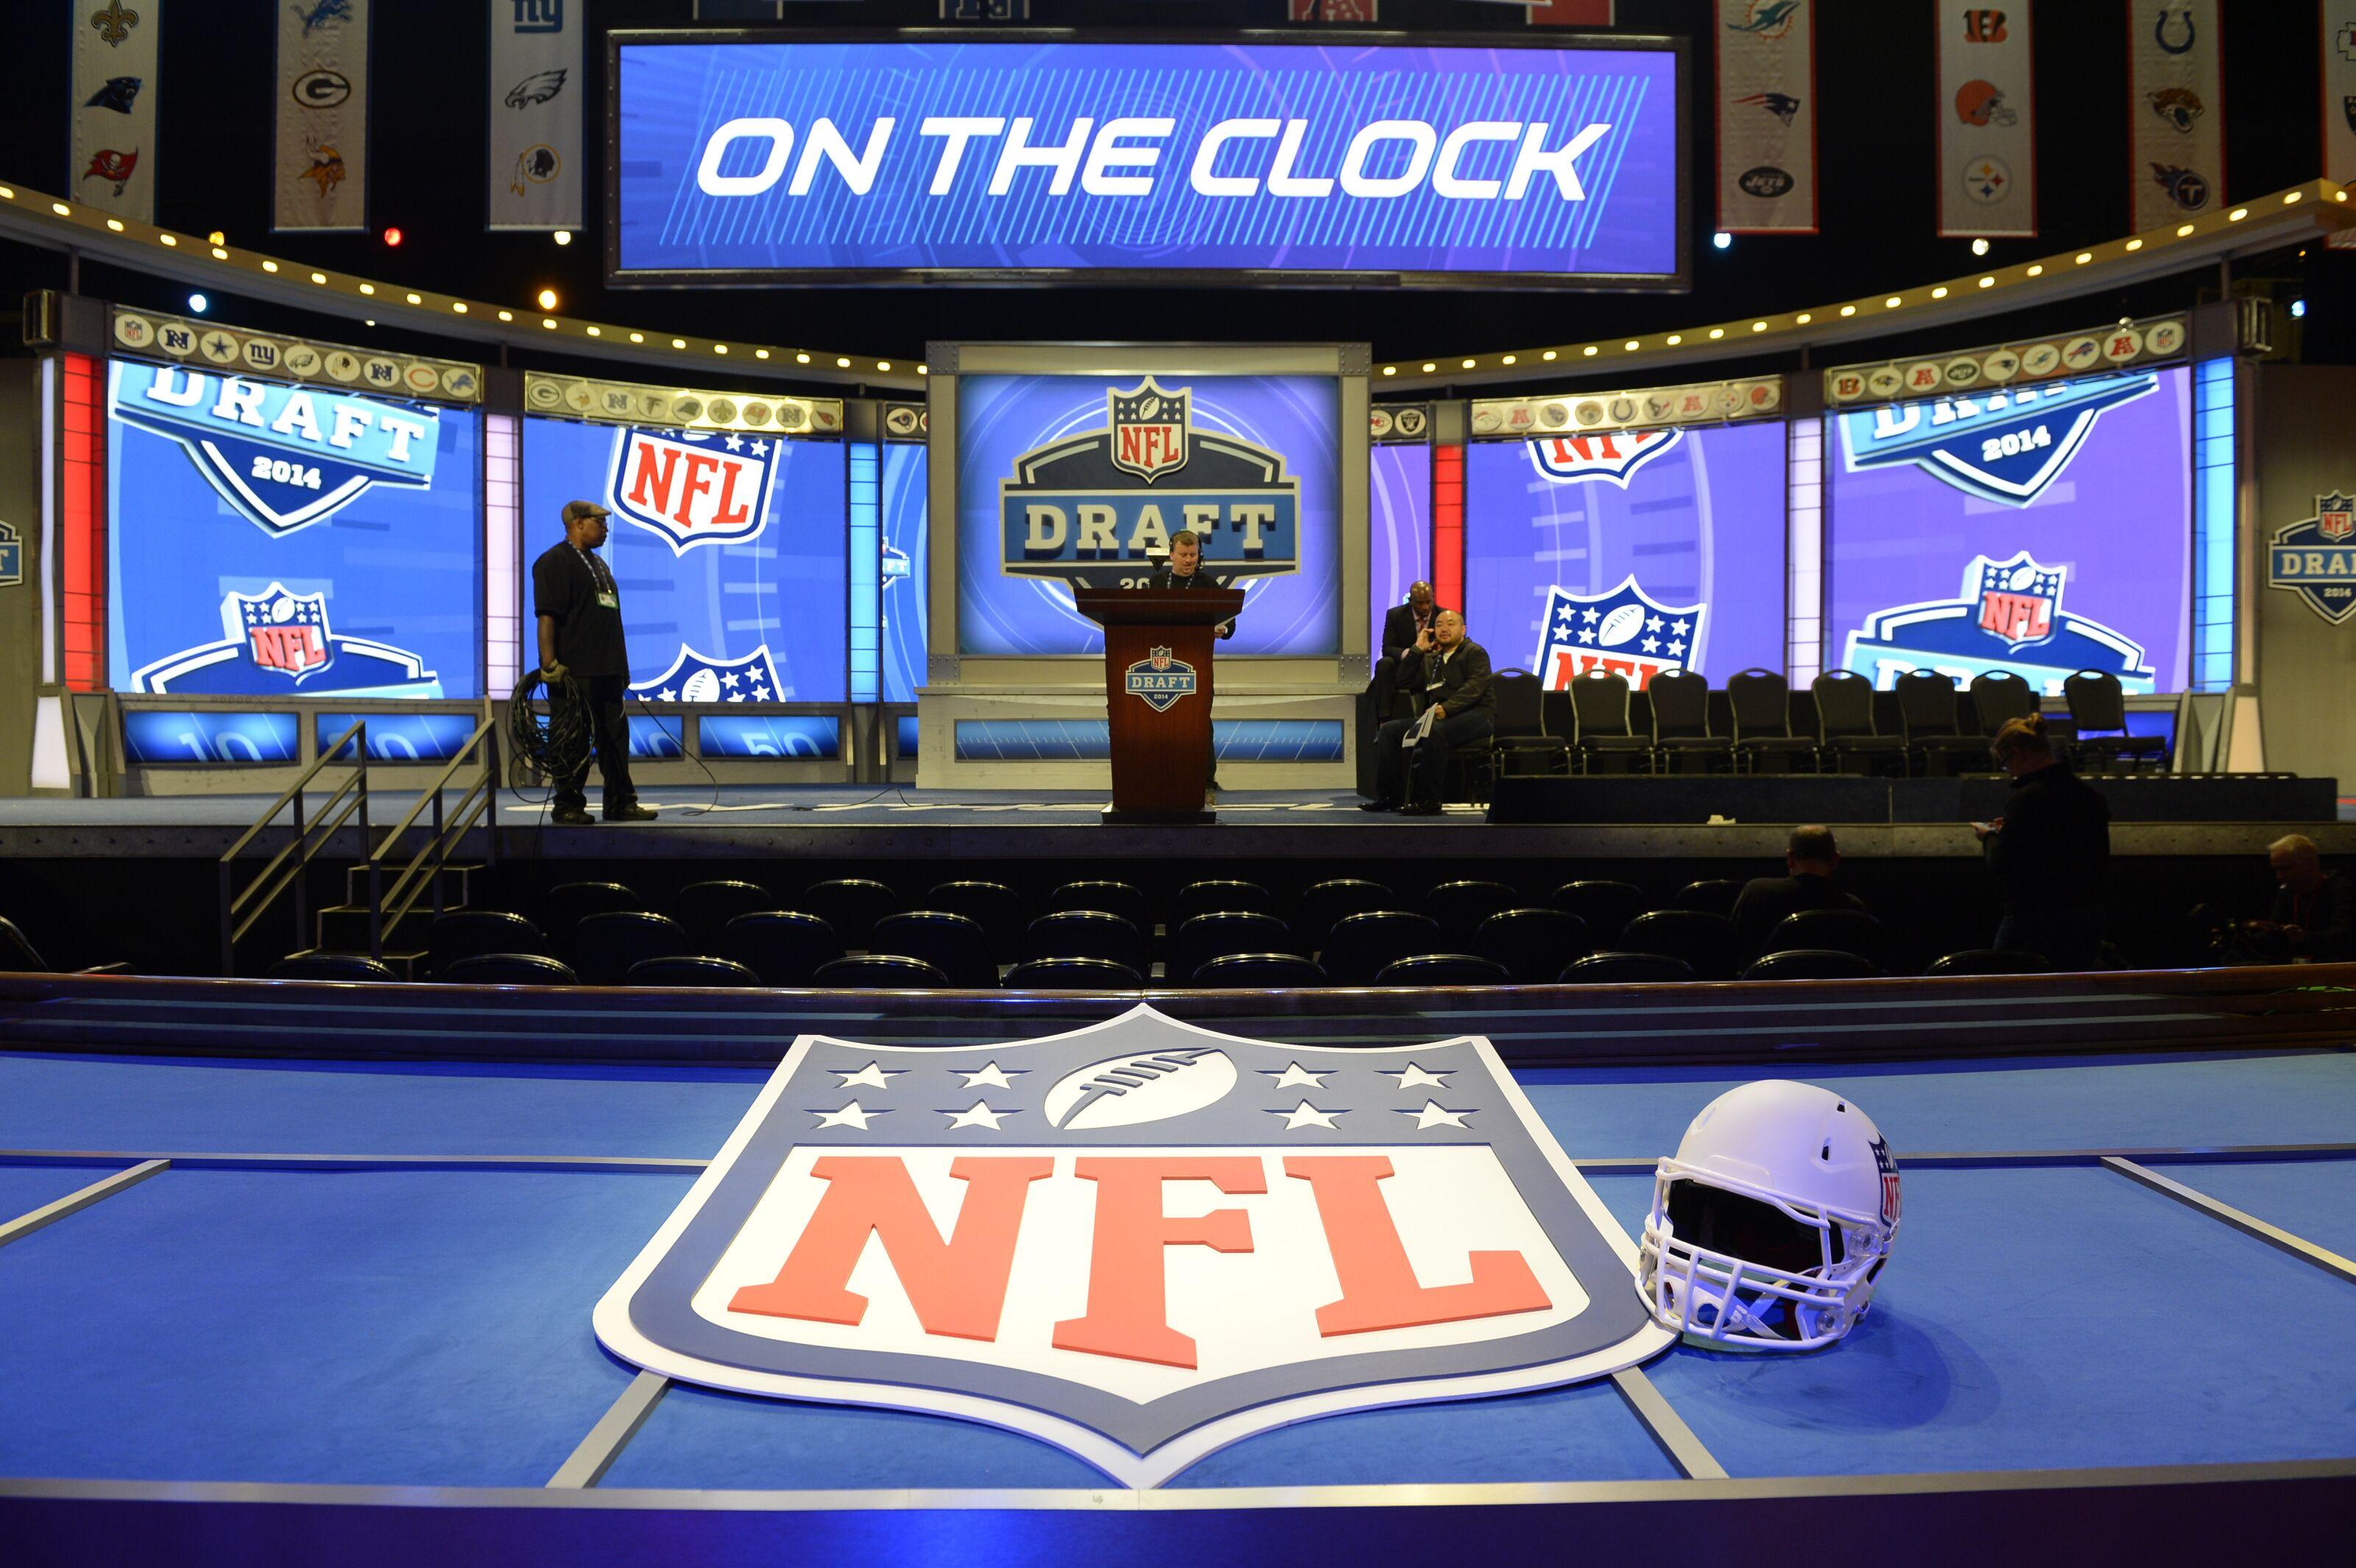 2019 NFL mock draft: Kyler Murray, Nick Bosa kick things off